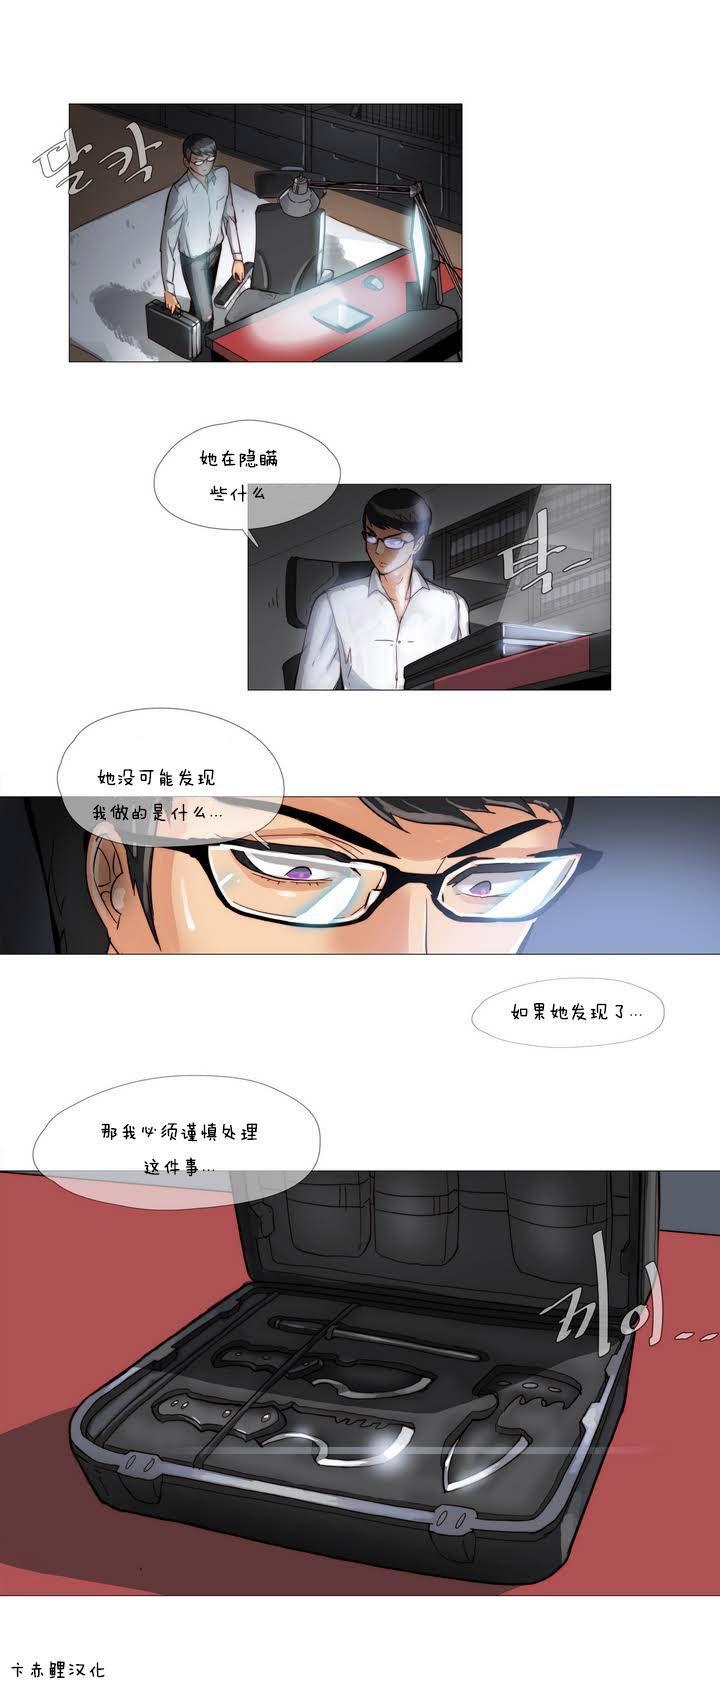 HouseHold Affairs 【卞赤鲤个人汉化】1~33话(持续更新中) 14